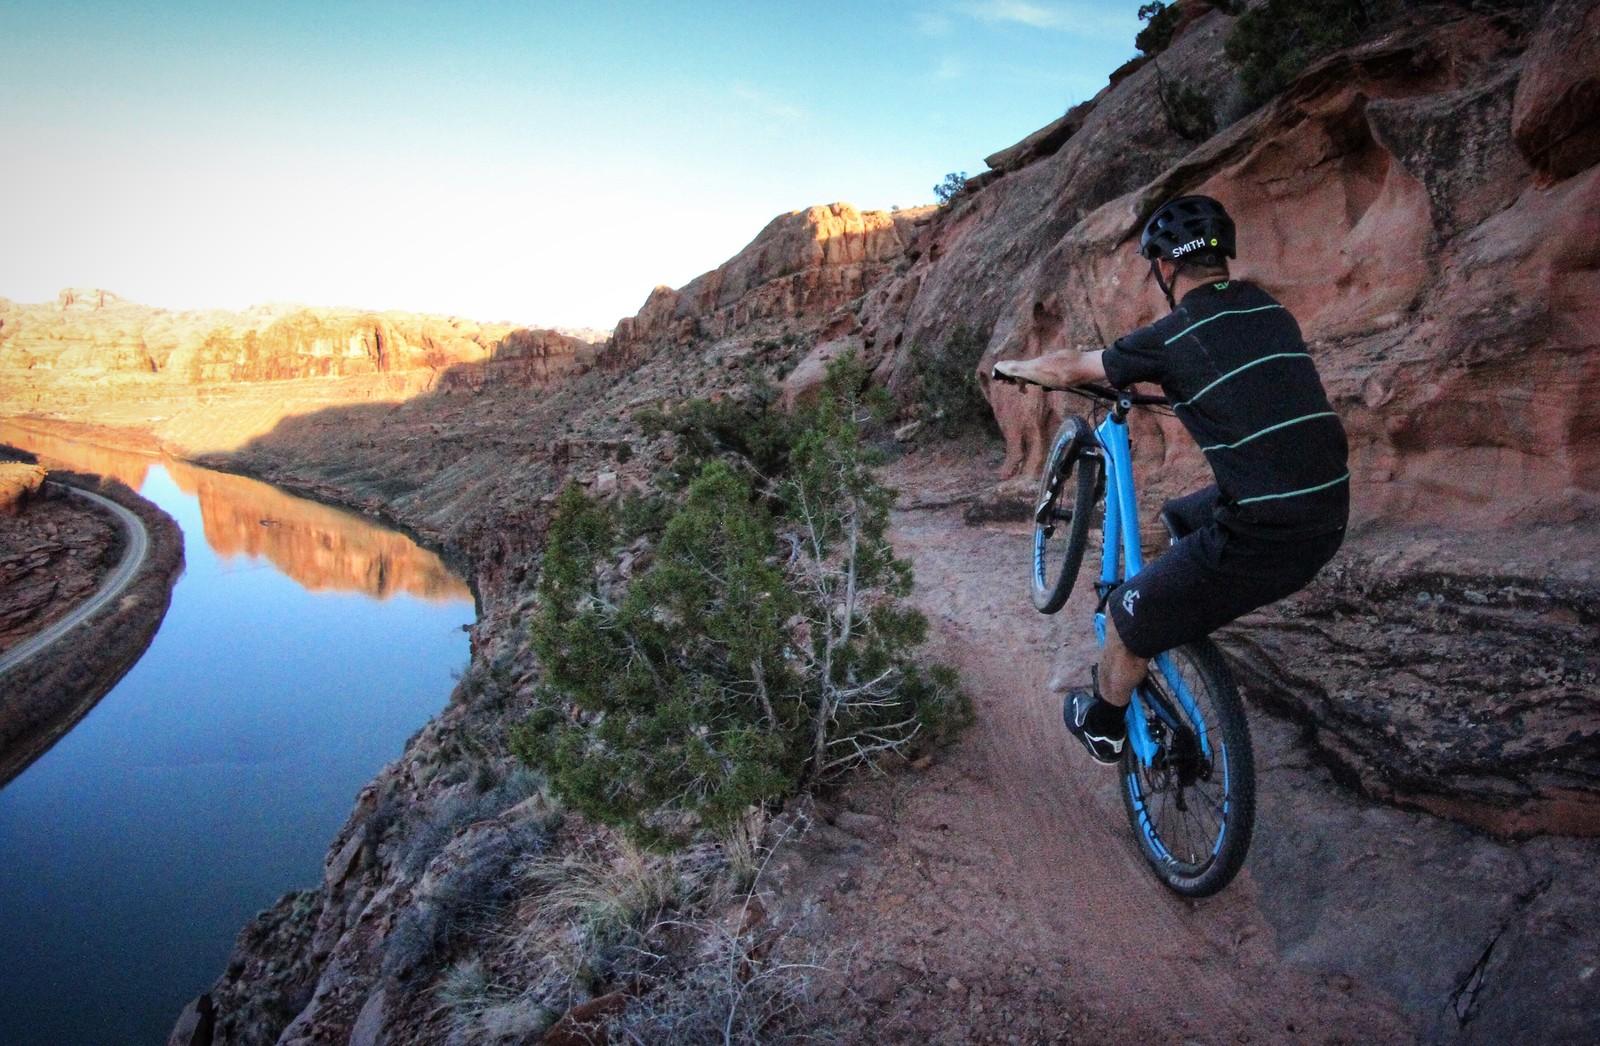 Jacksons Manual  - AMERICAN - Mountain Biking Pictures - Vital MTB